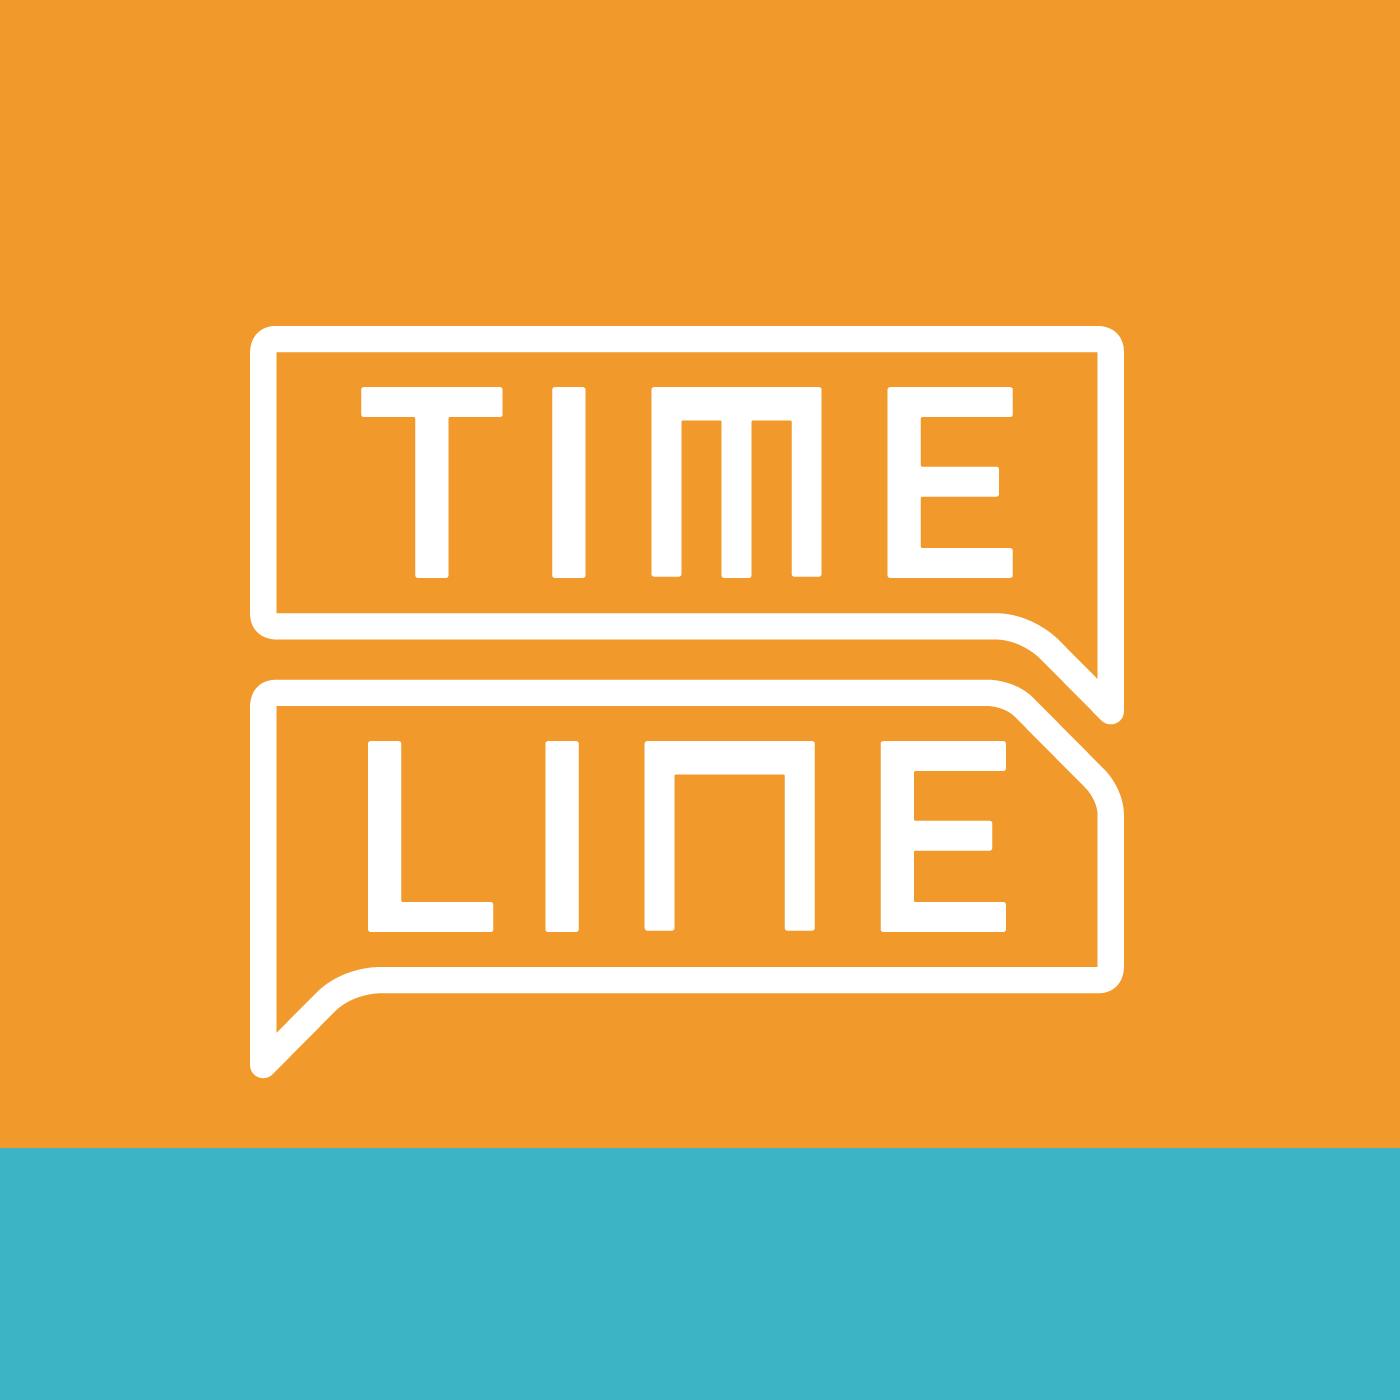 Timeline Gaúcha 21.02.2018